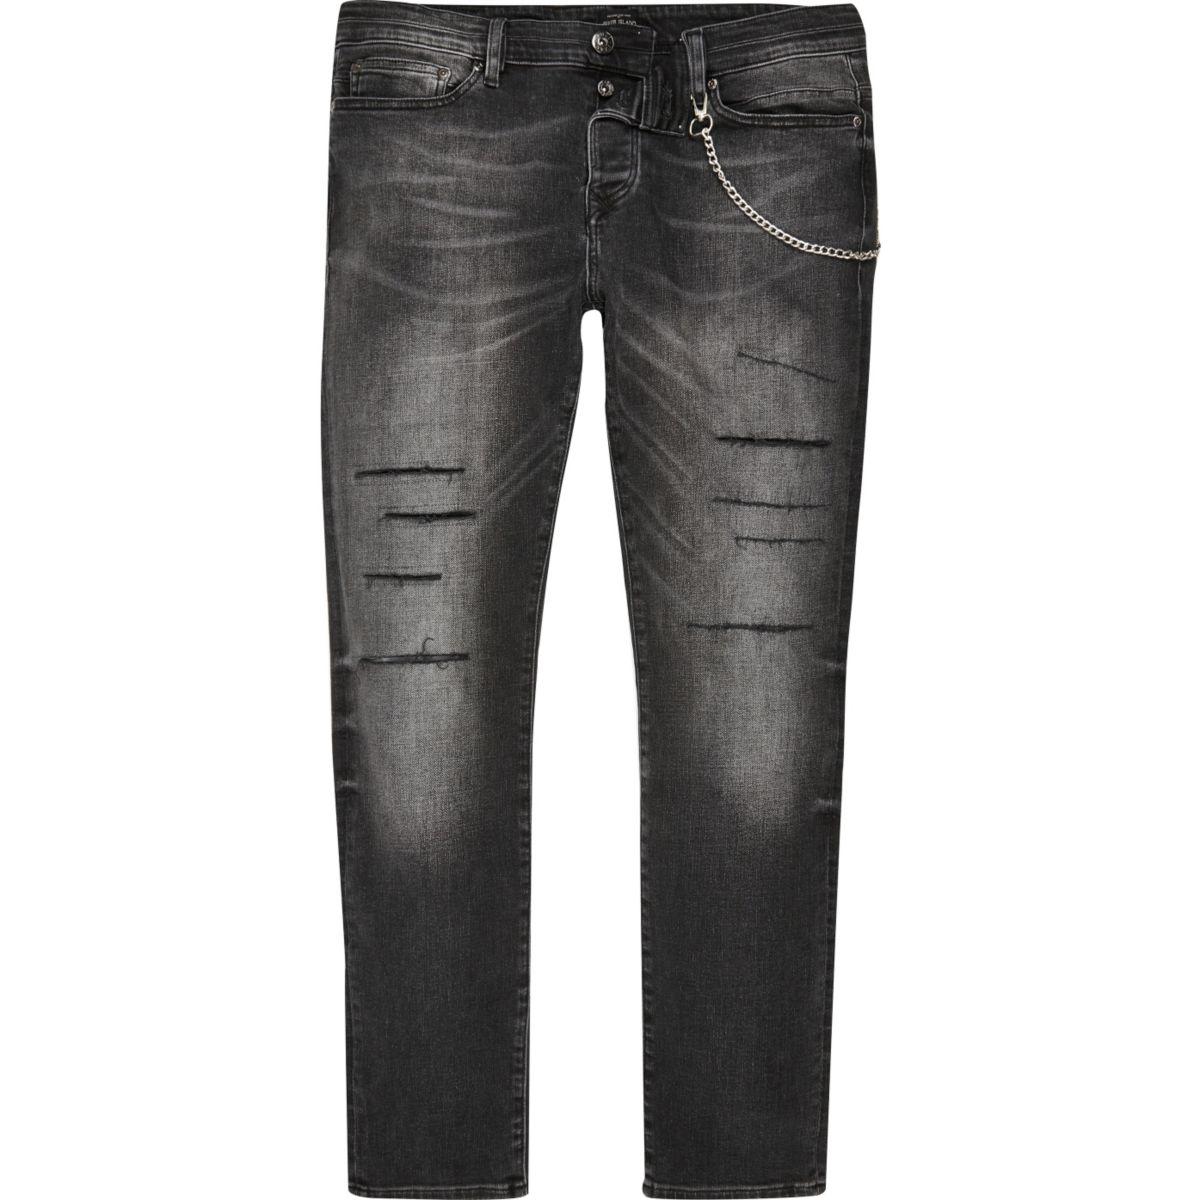 Sid - Zwarte wash smaltoelopende skinny jeans